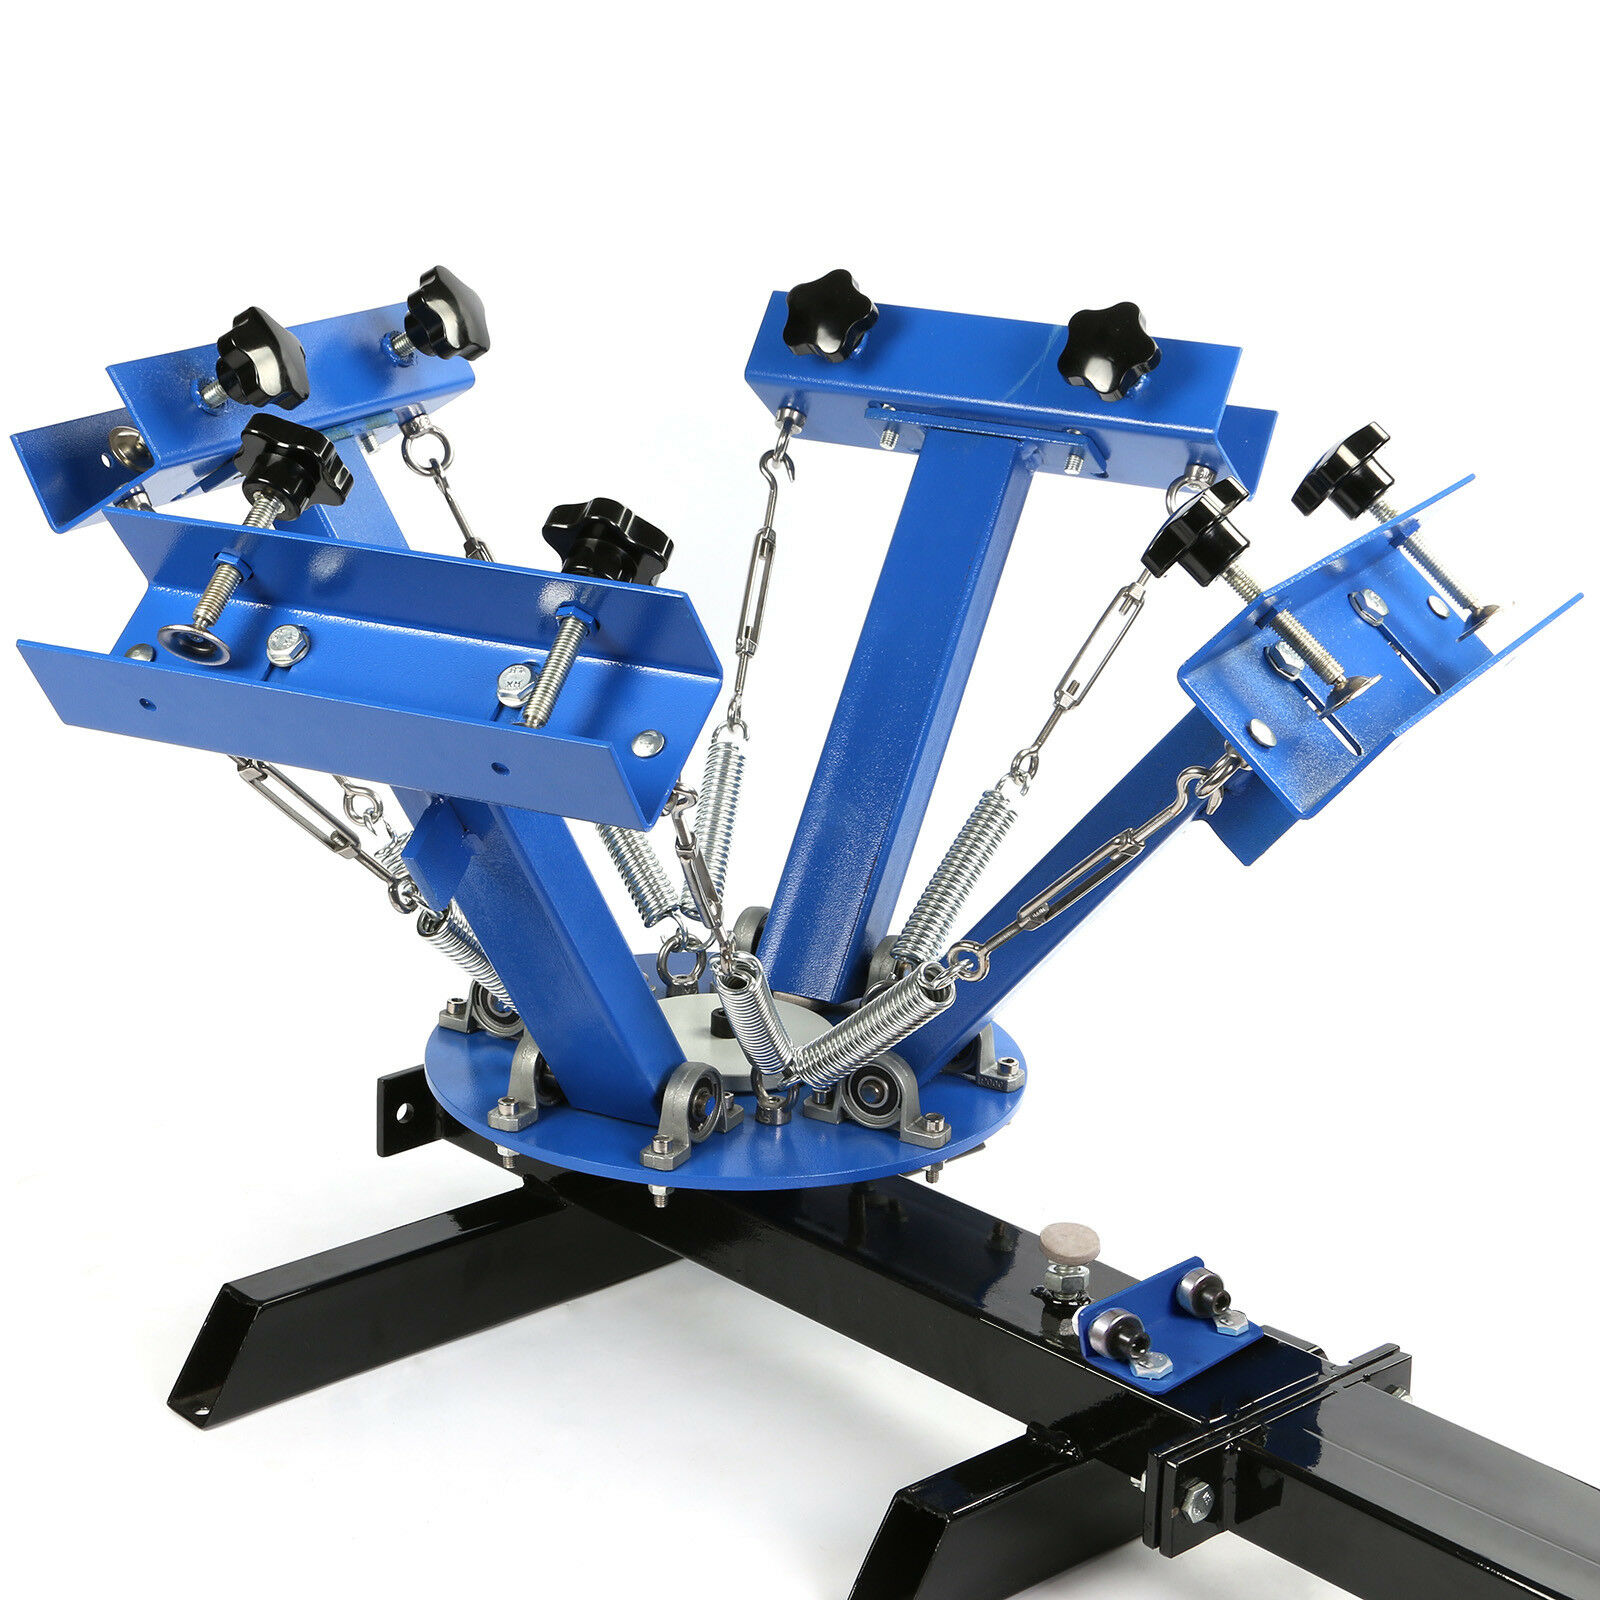 Screen Printing Press Free Shipping 4 Color 1 Station For T-Shirt DIY Printing enlarge